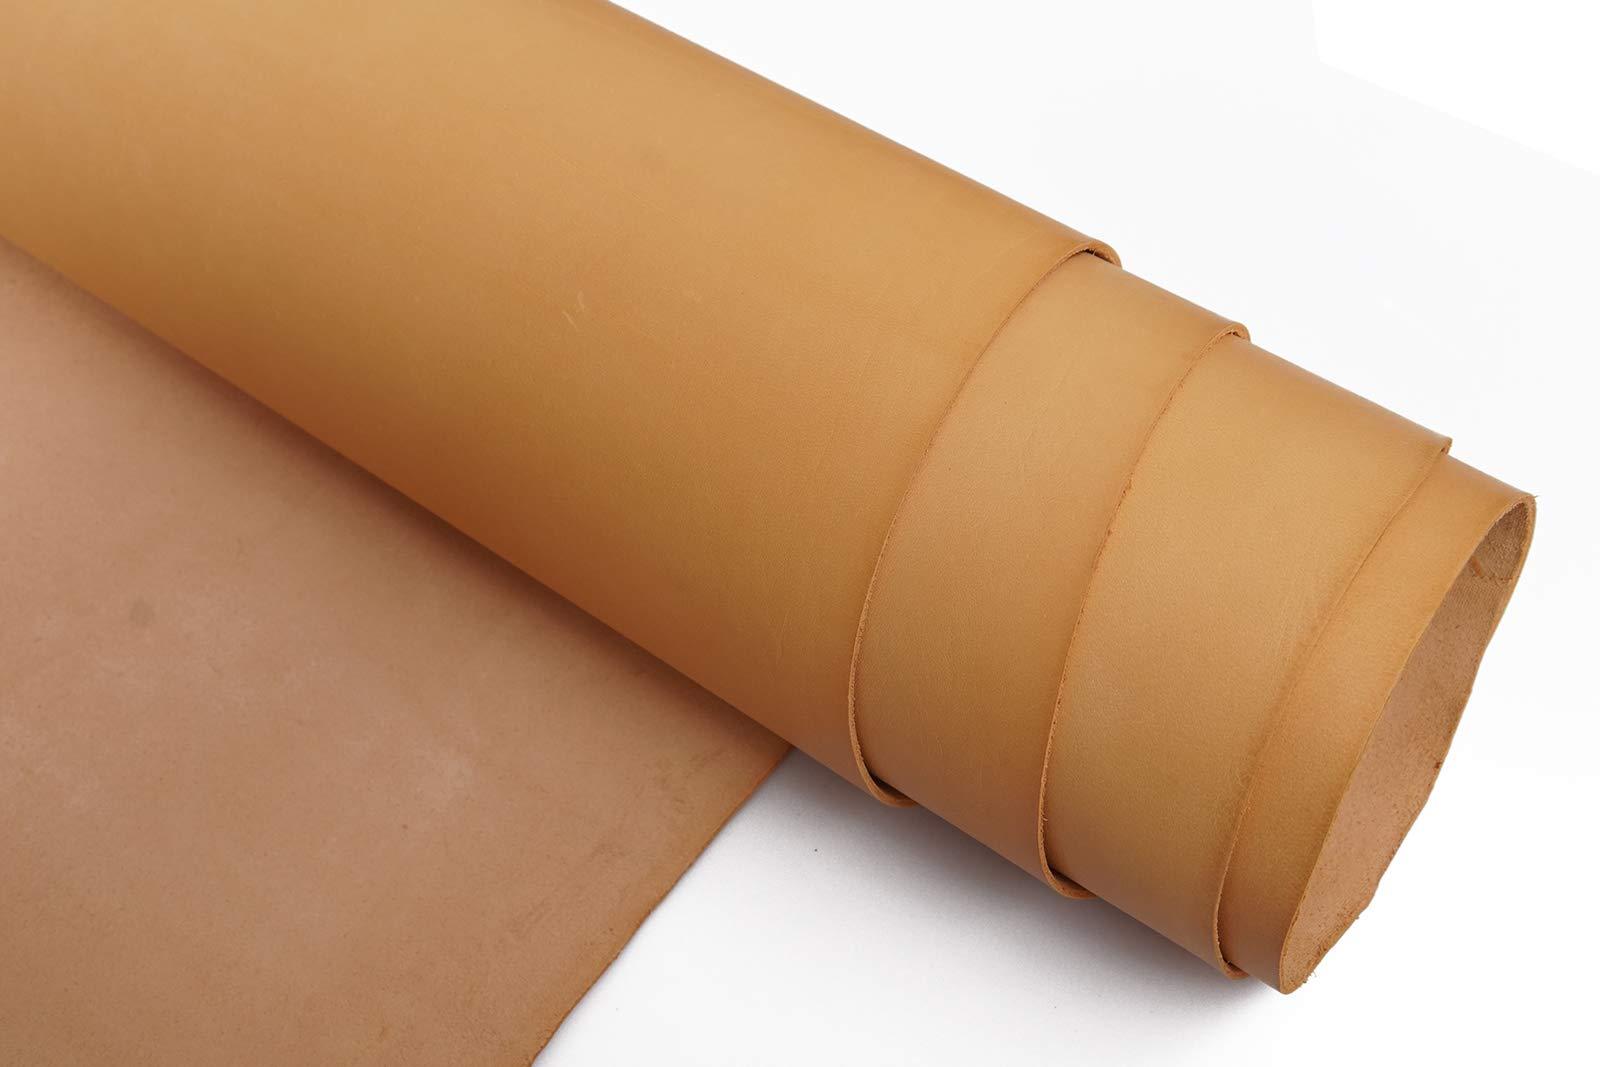 Veg Tan Tooling Leather 2.0mm Full Grain Stiff Cowhide Handmade DIY Art Crafts Carving Firm Genuine Leather by Jeereal